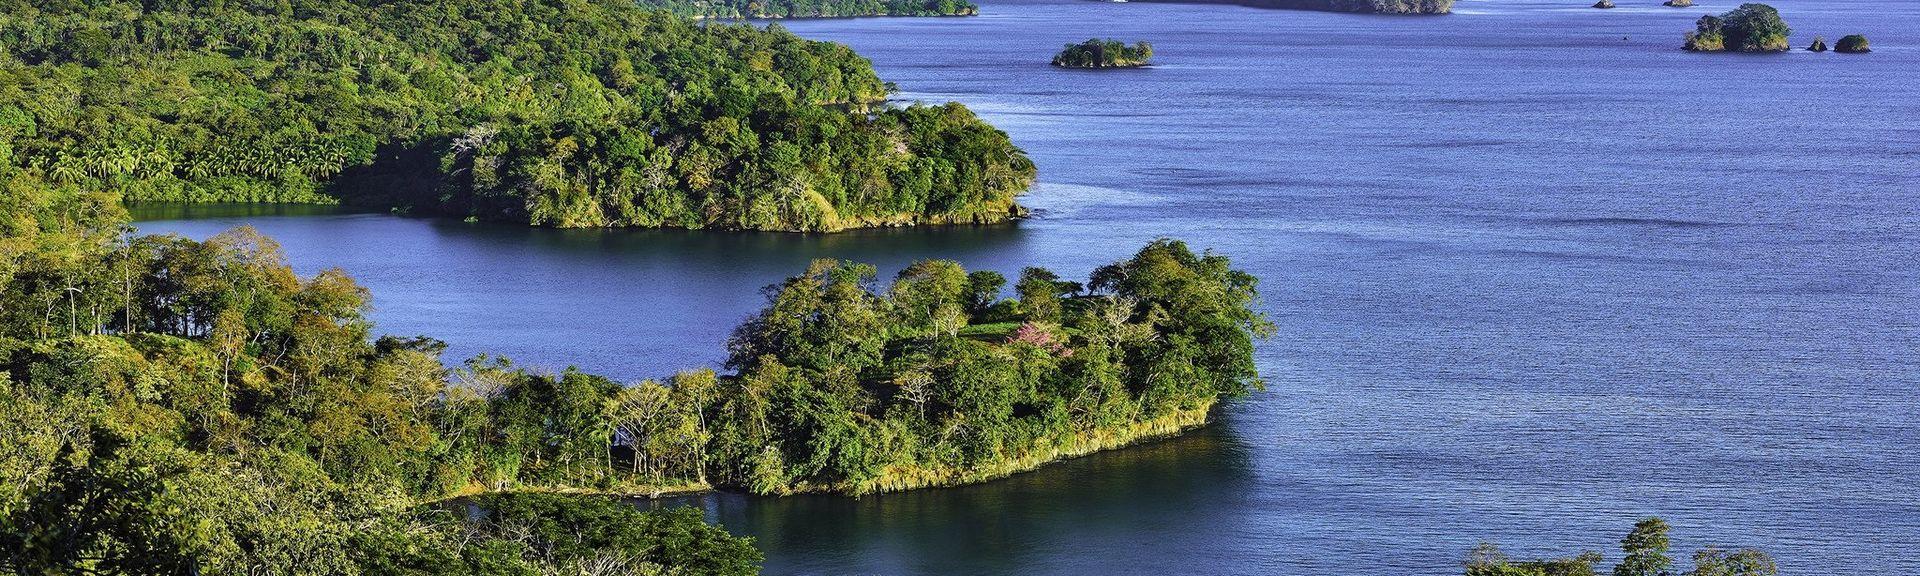 Chiriqui, Chiriqui (province), Panama